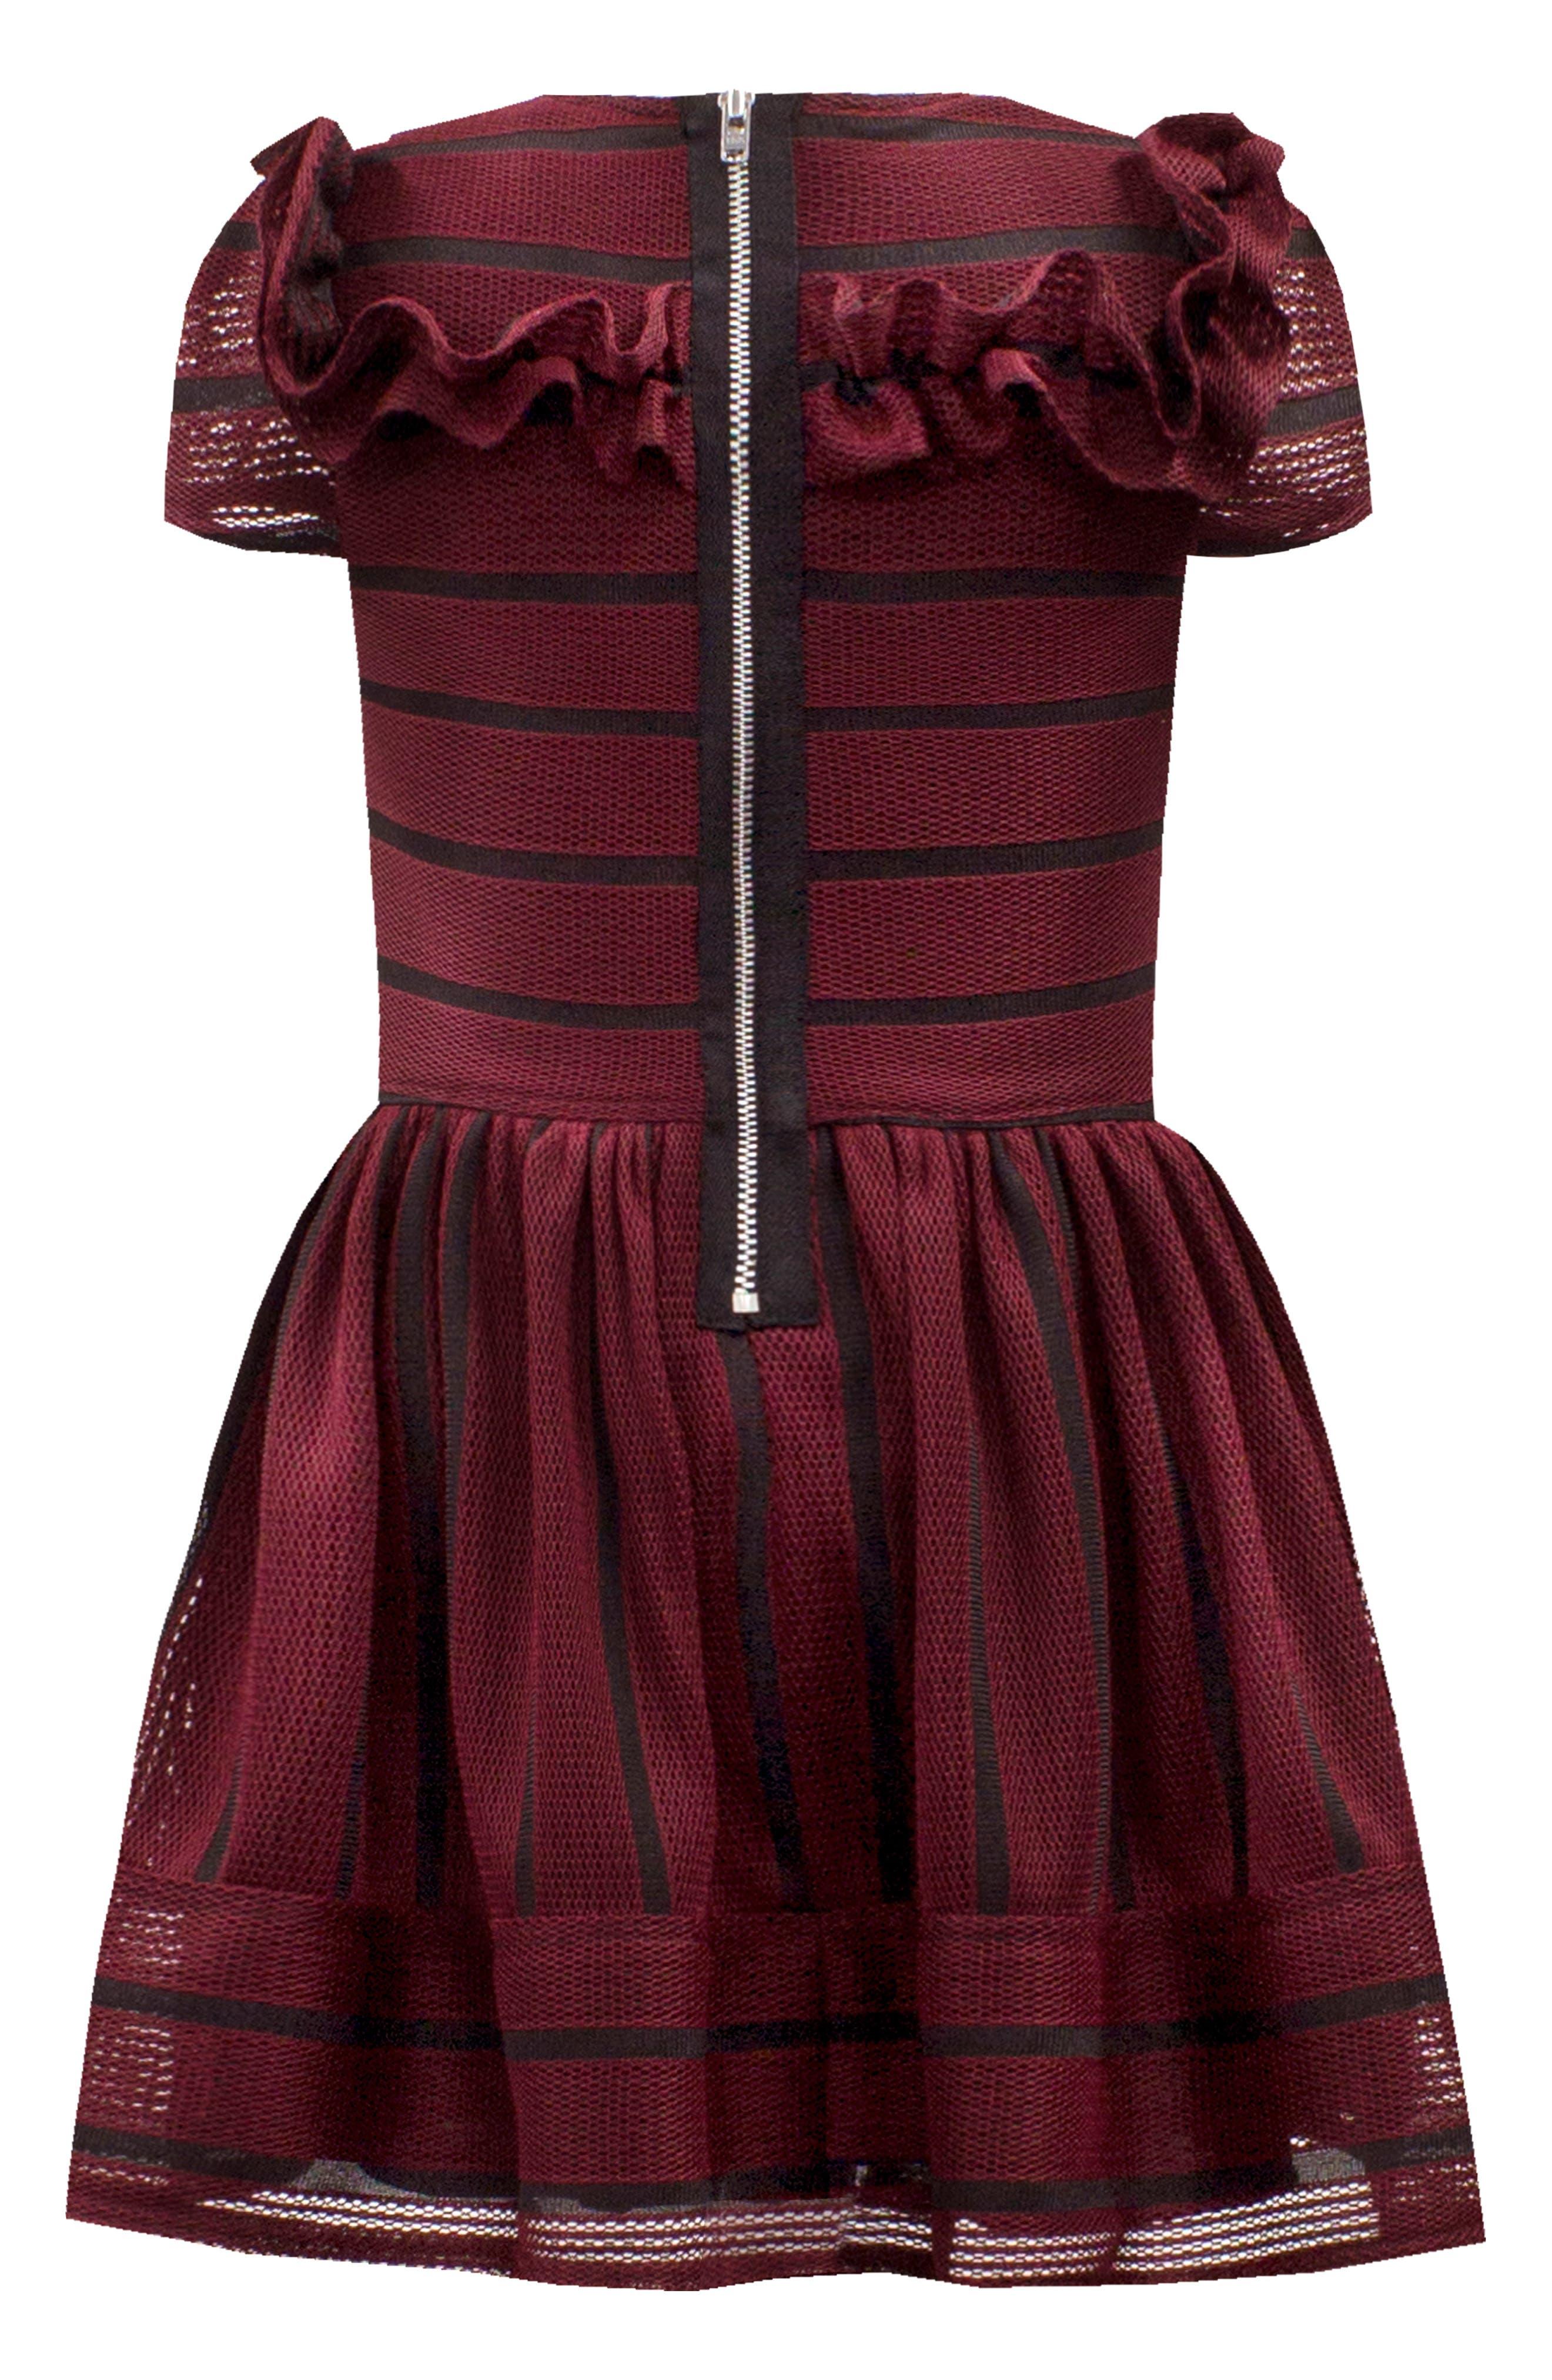 DAVID CHARLES,                             Stripe Techno Frill Fit & Flare Dress,                             Alternate thumbnail 2, color,                             WINE